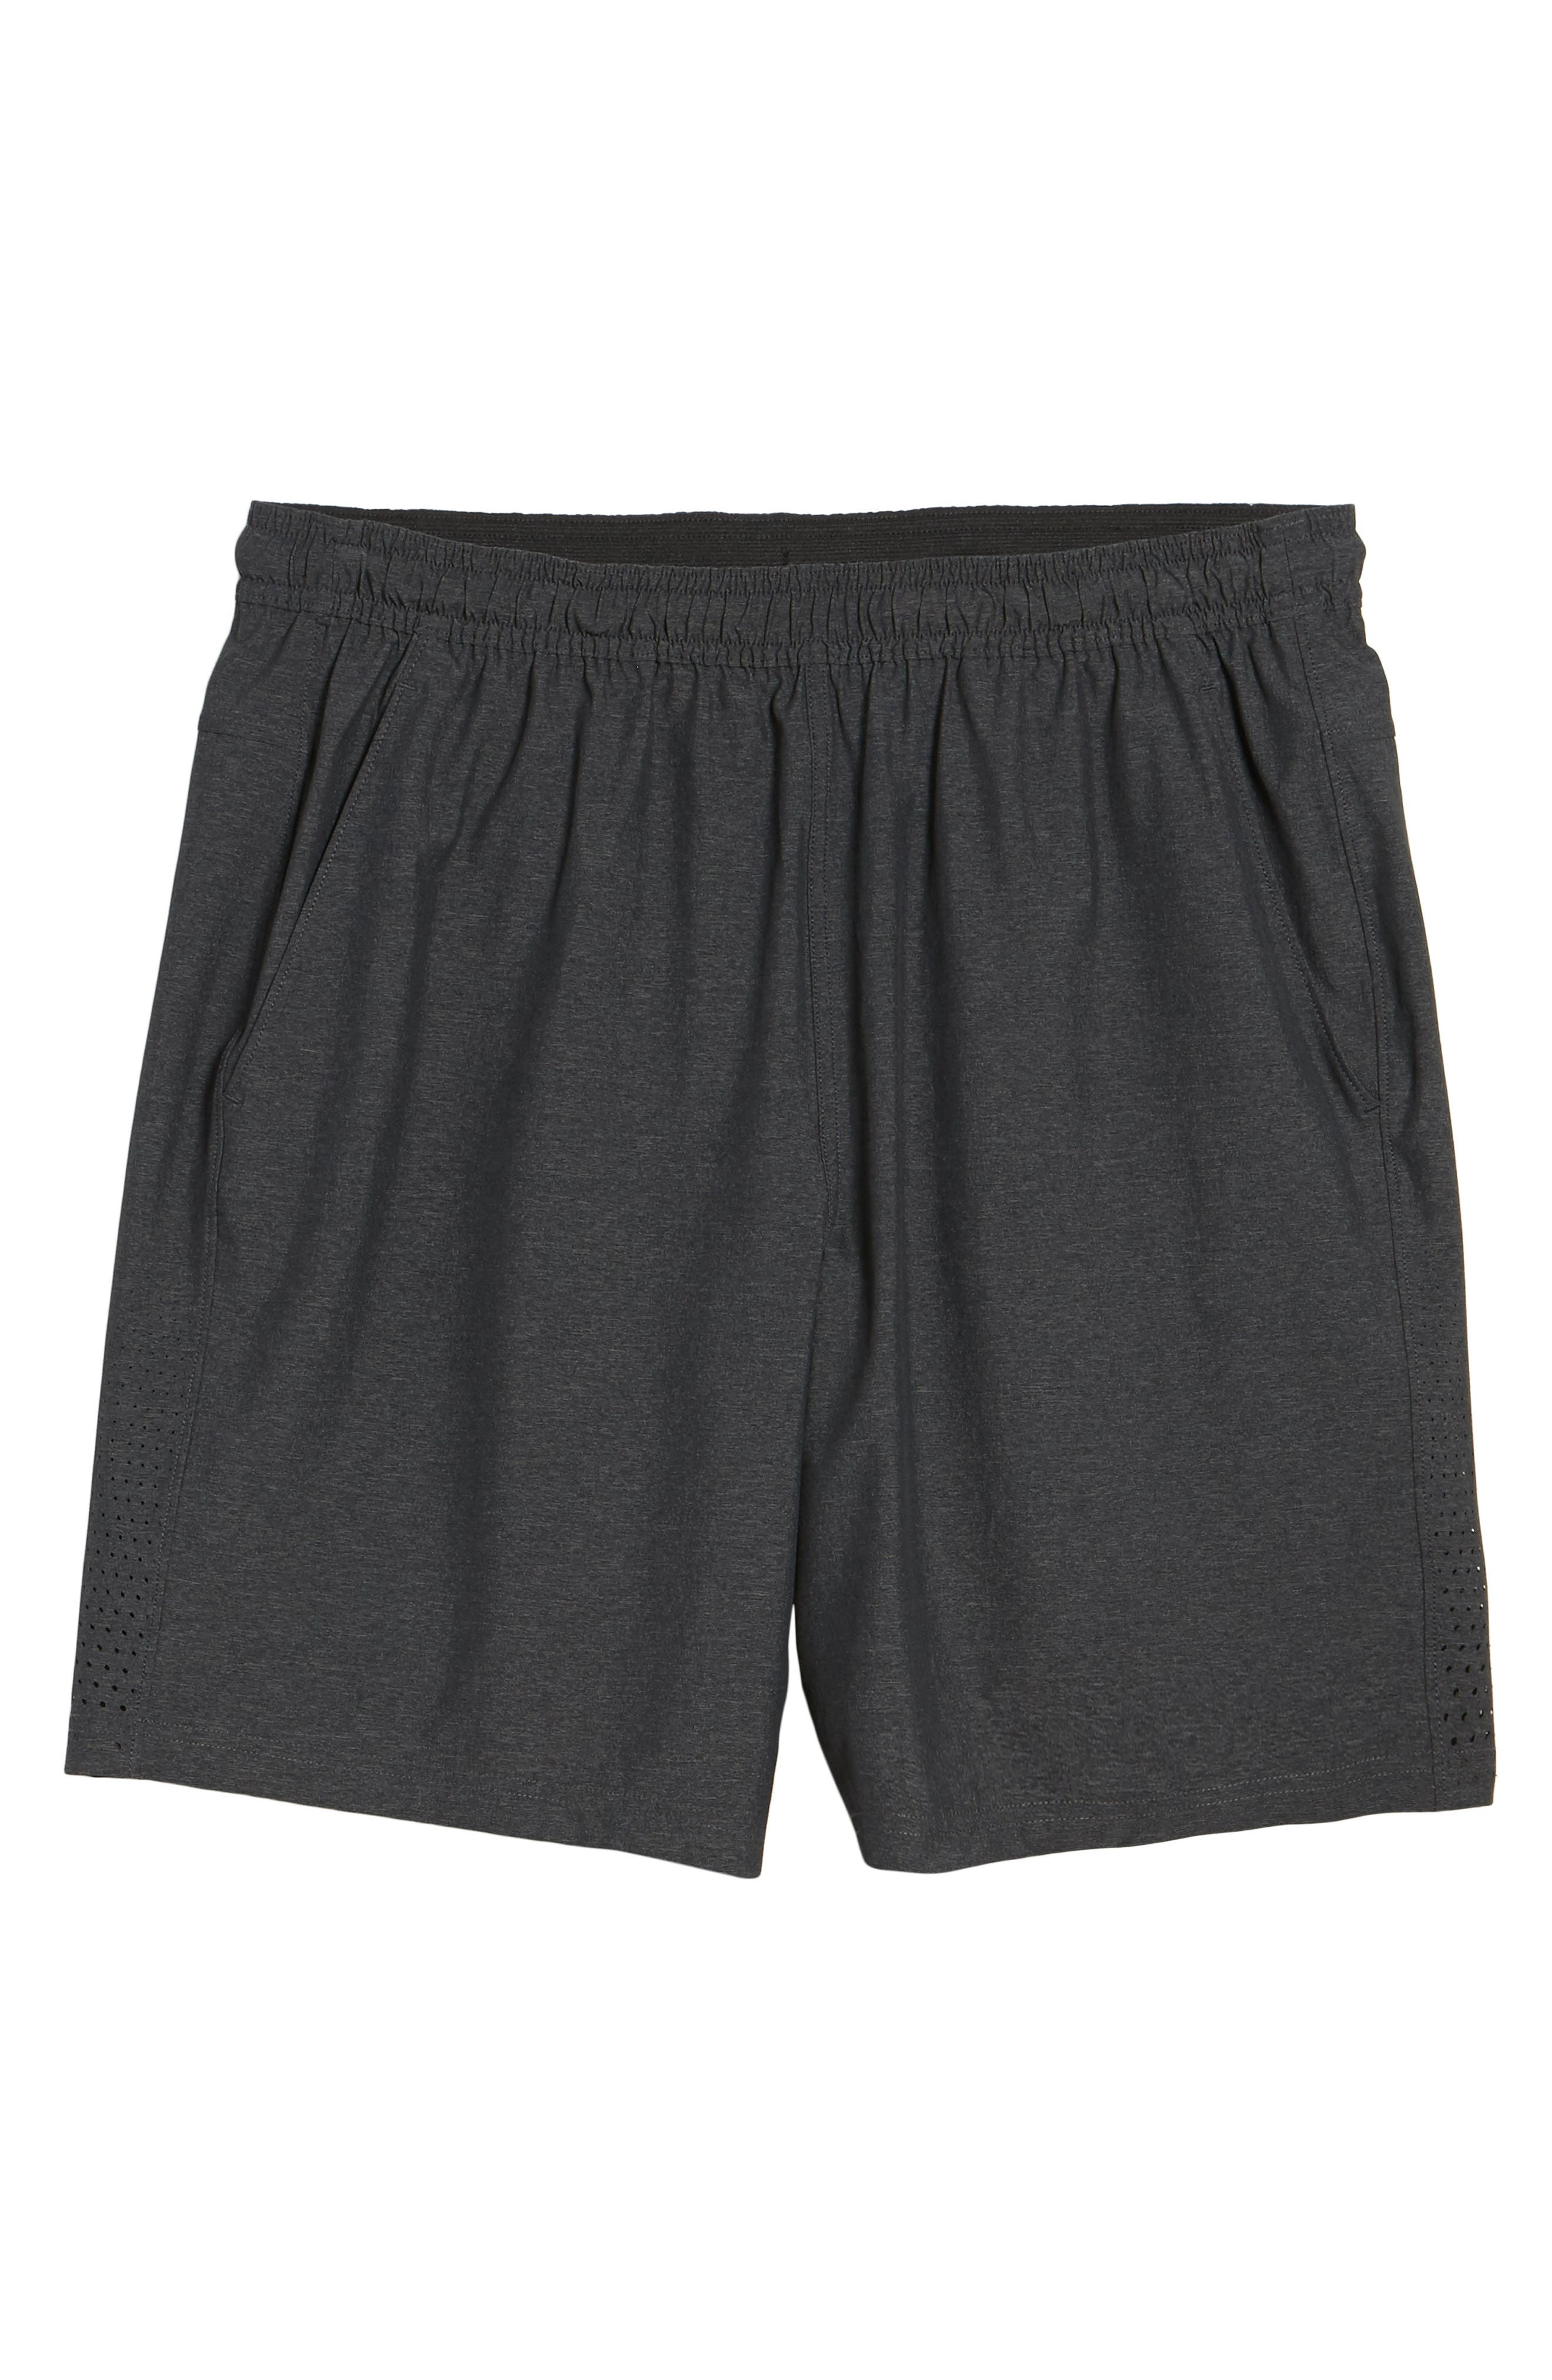 Graphite Shorts,                             Alternate thumbnail 6, color,